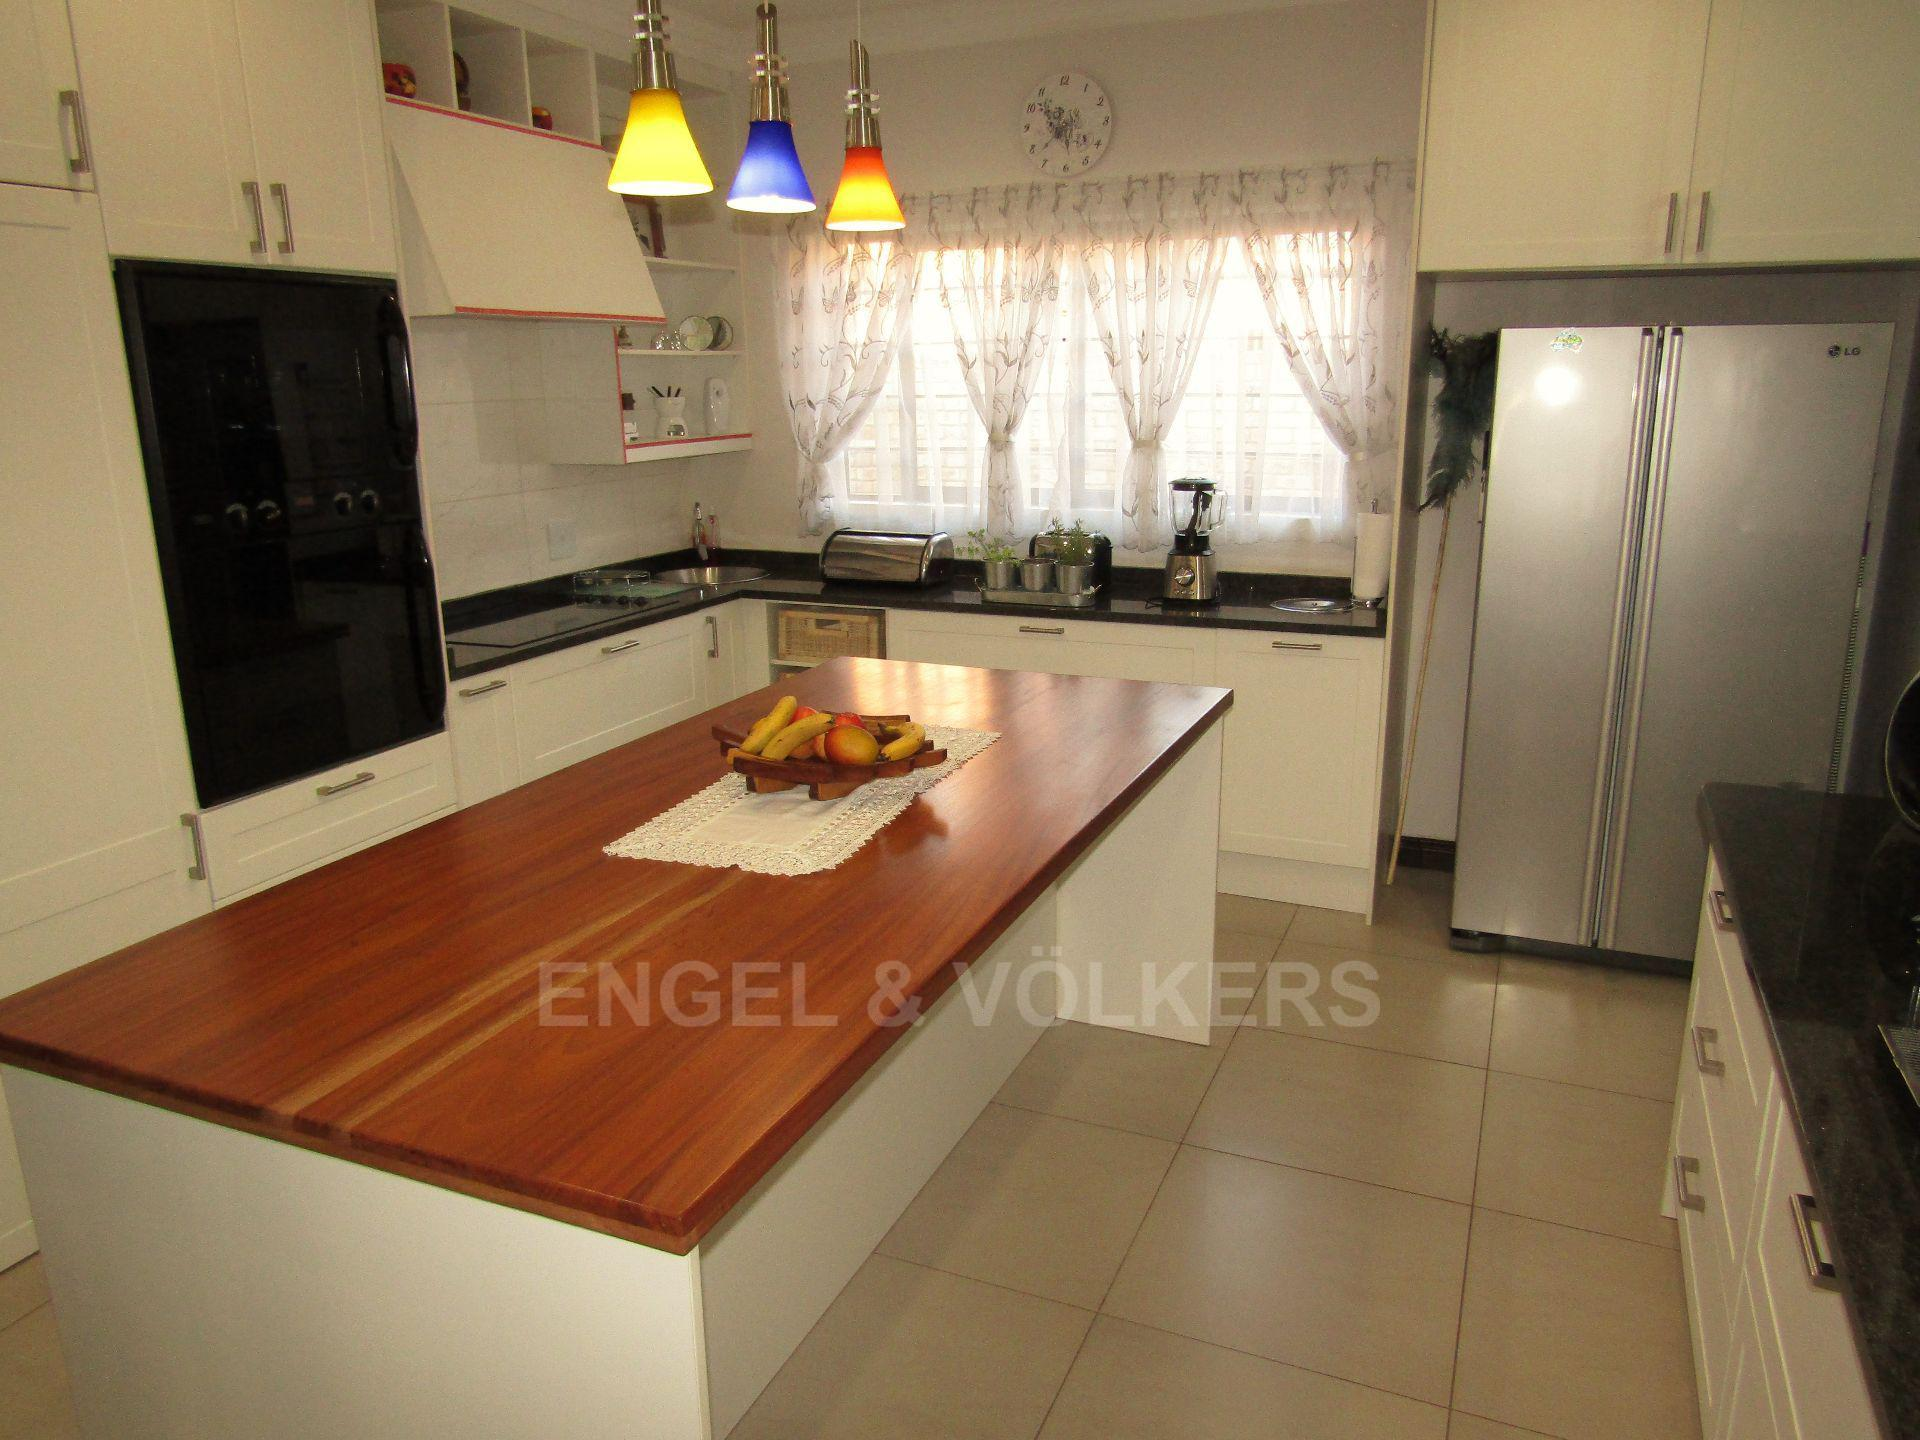 Lifestyle Estate property for sale. Ref No: 13458759. Picture no 7